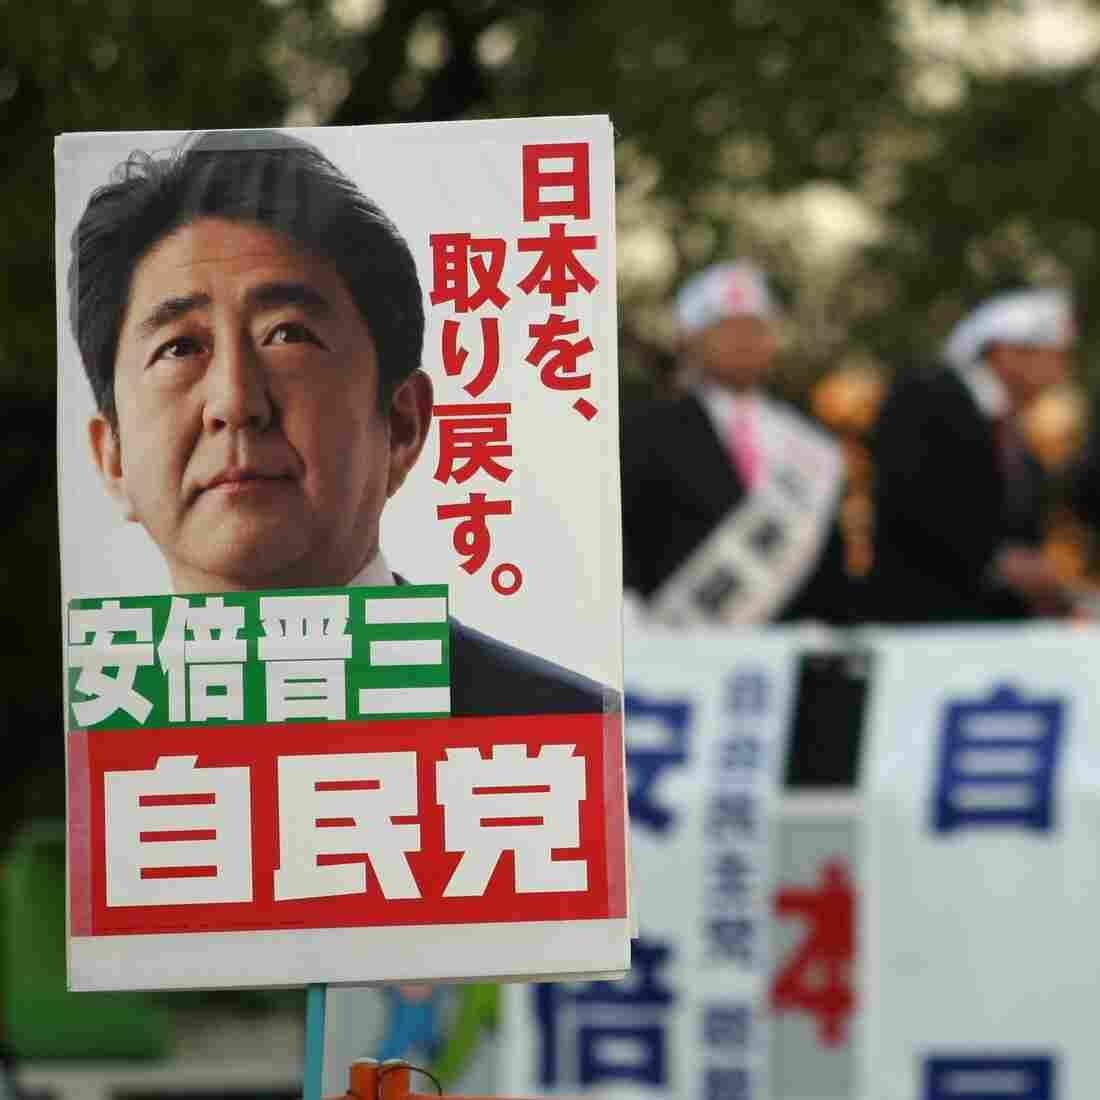 Nationalist Rhetoric High As Japanese Head To Polls